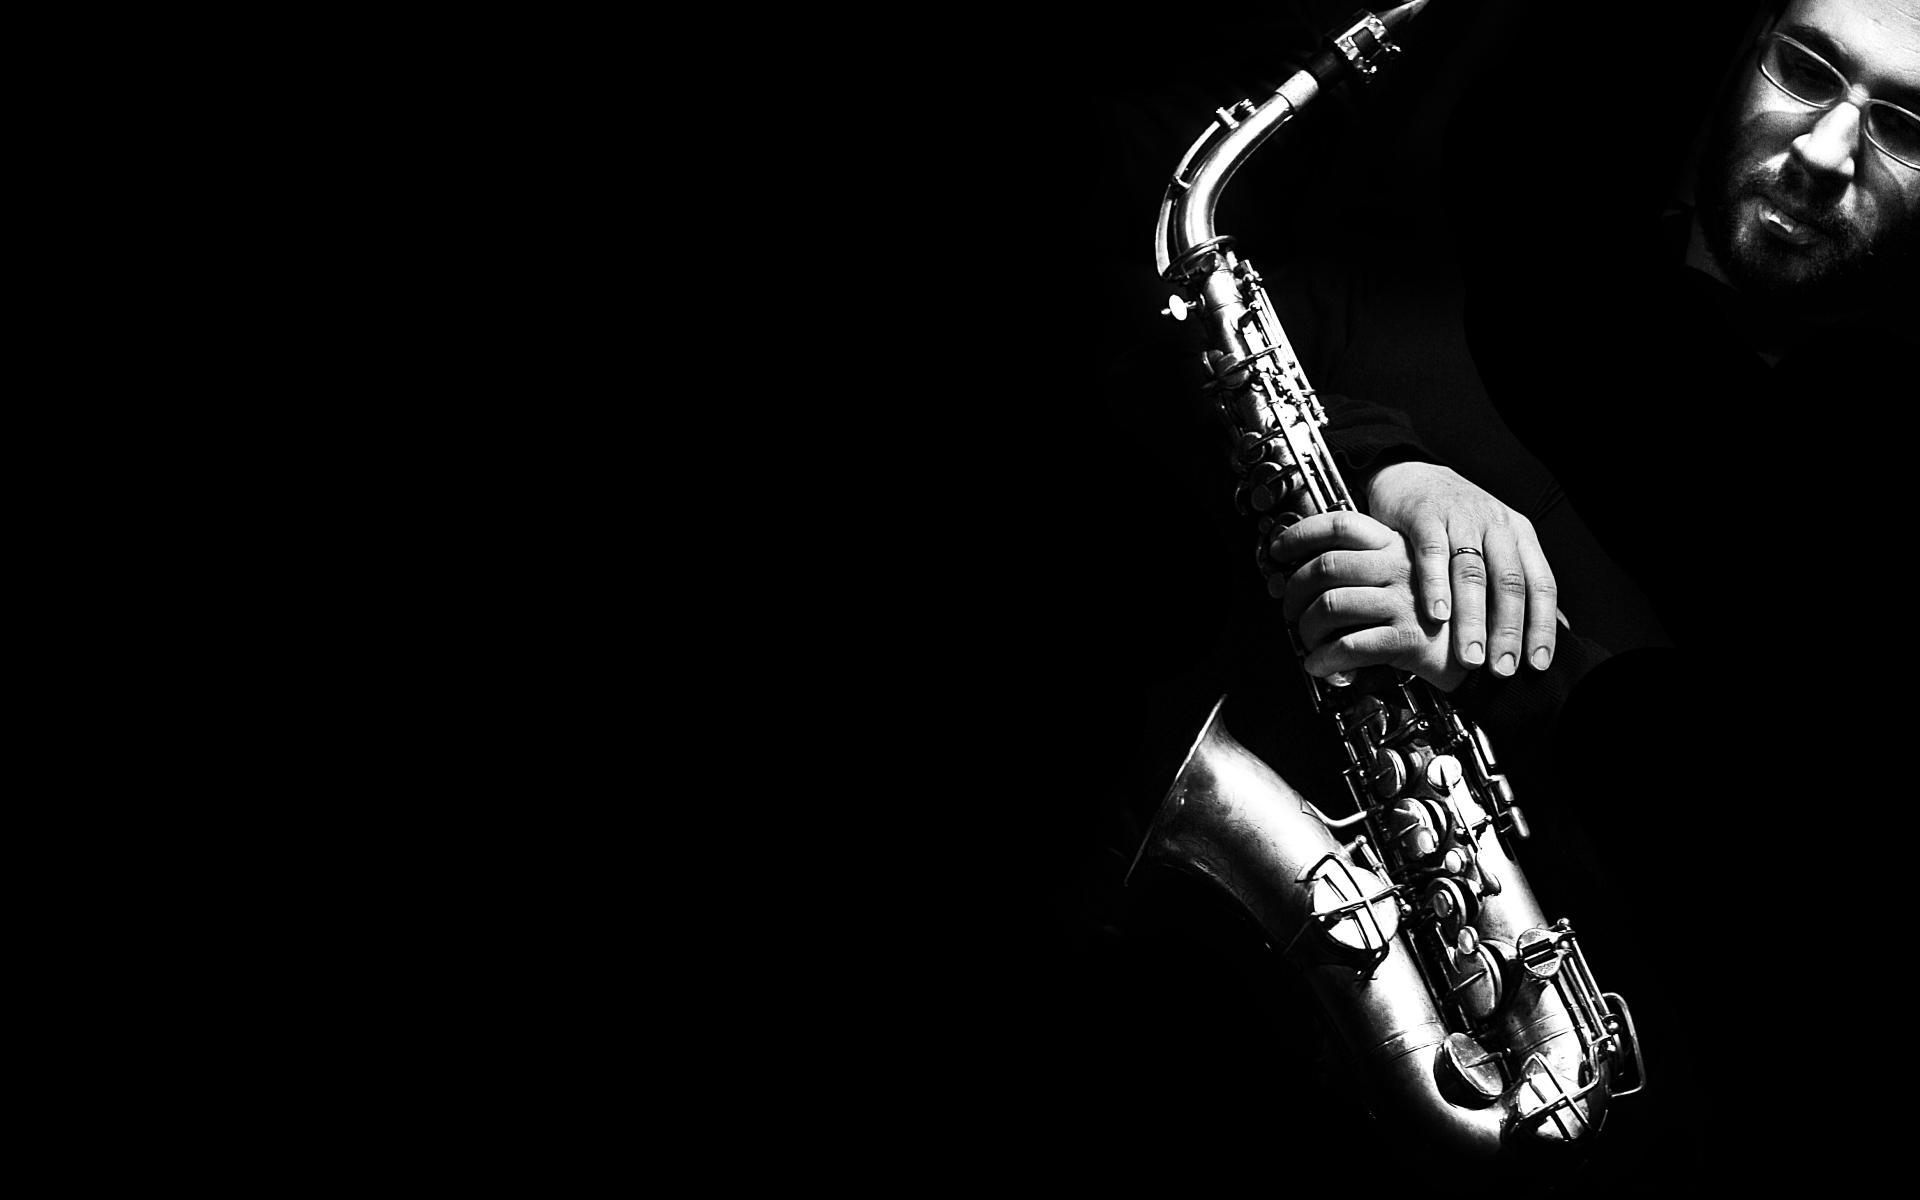 jazz band wallpapers - photo #38